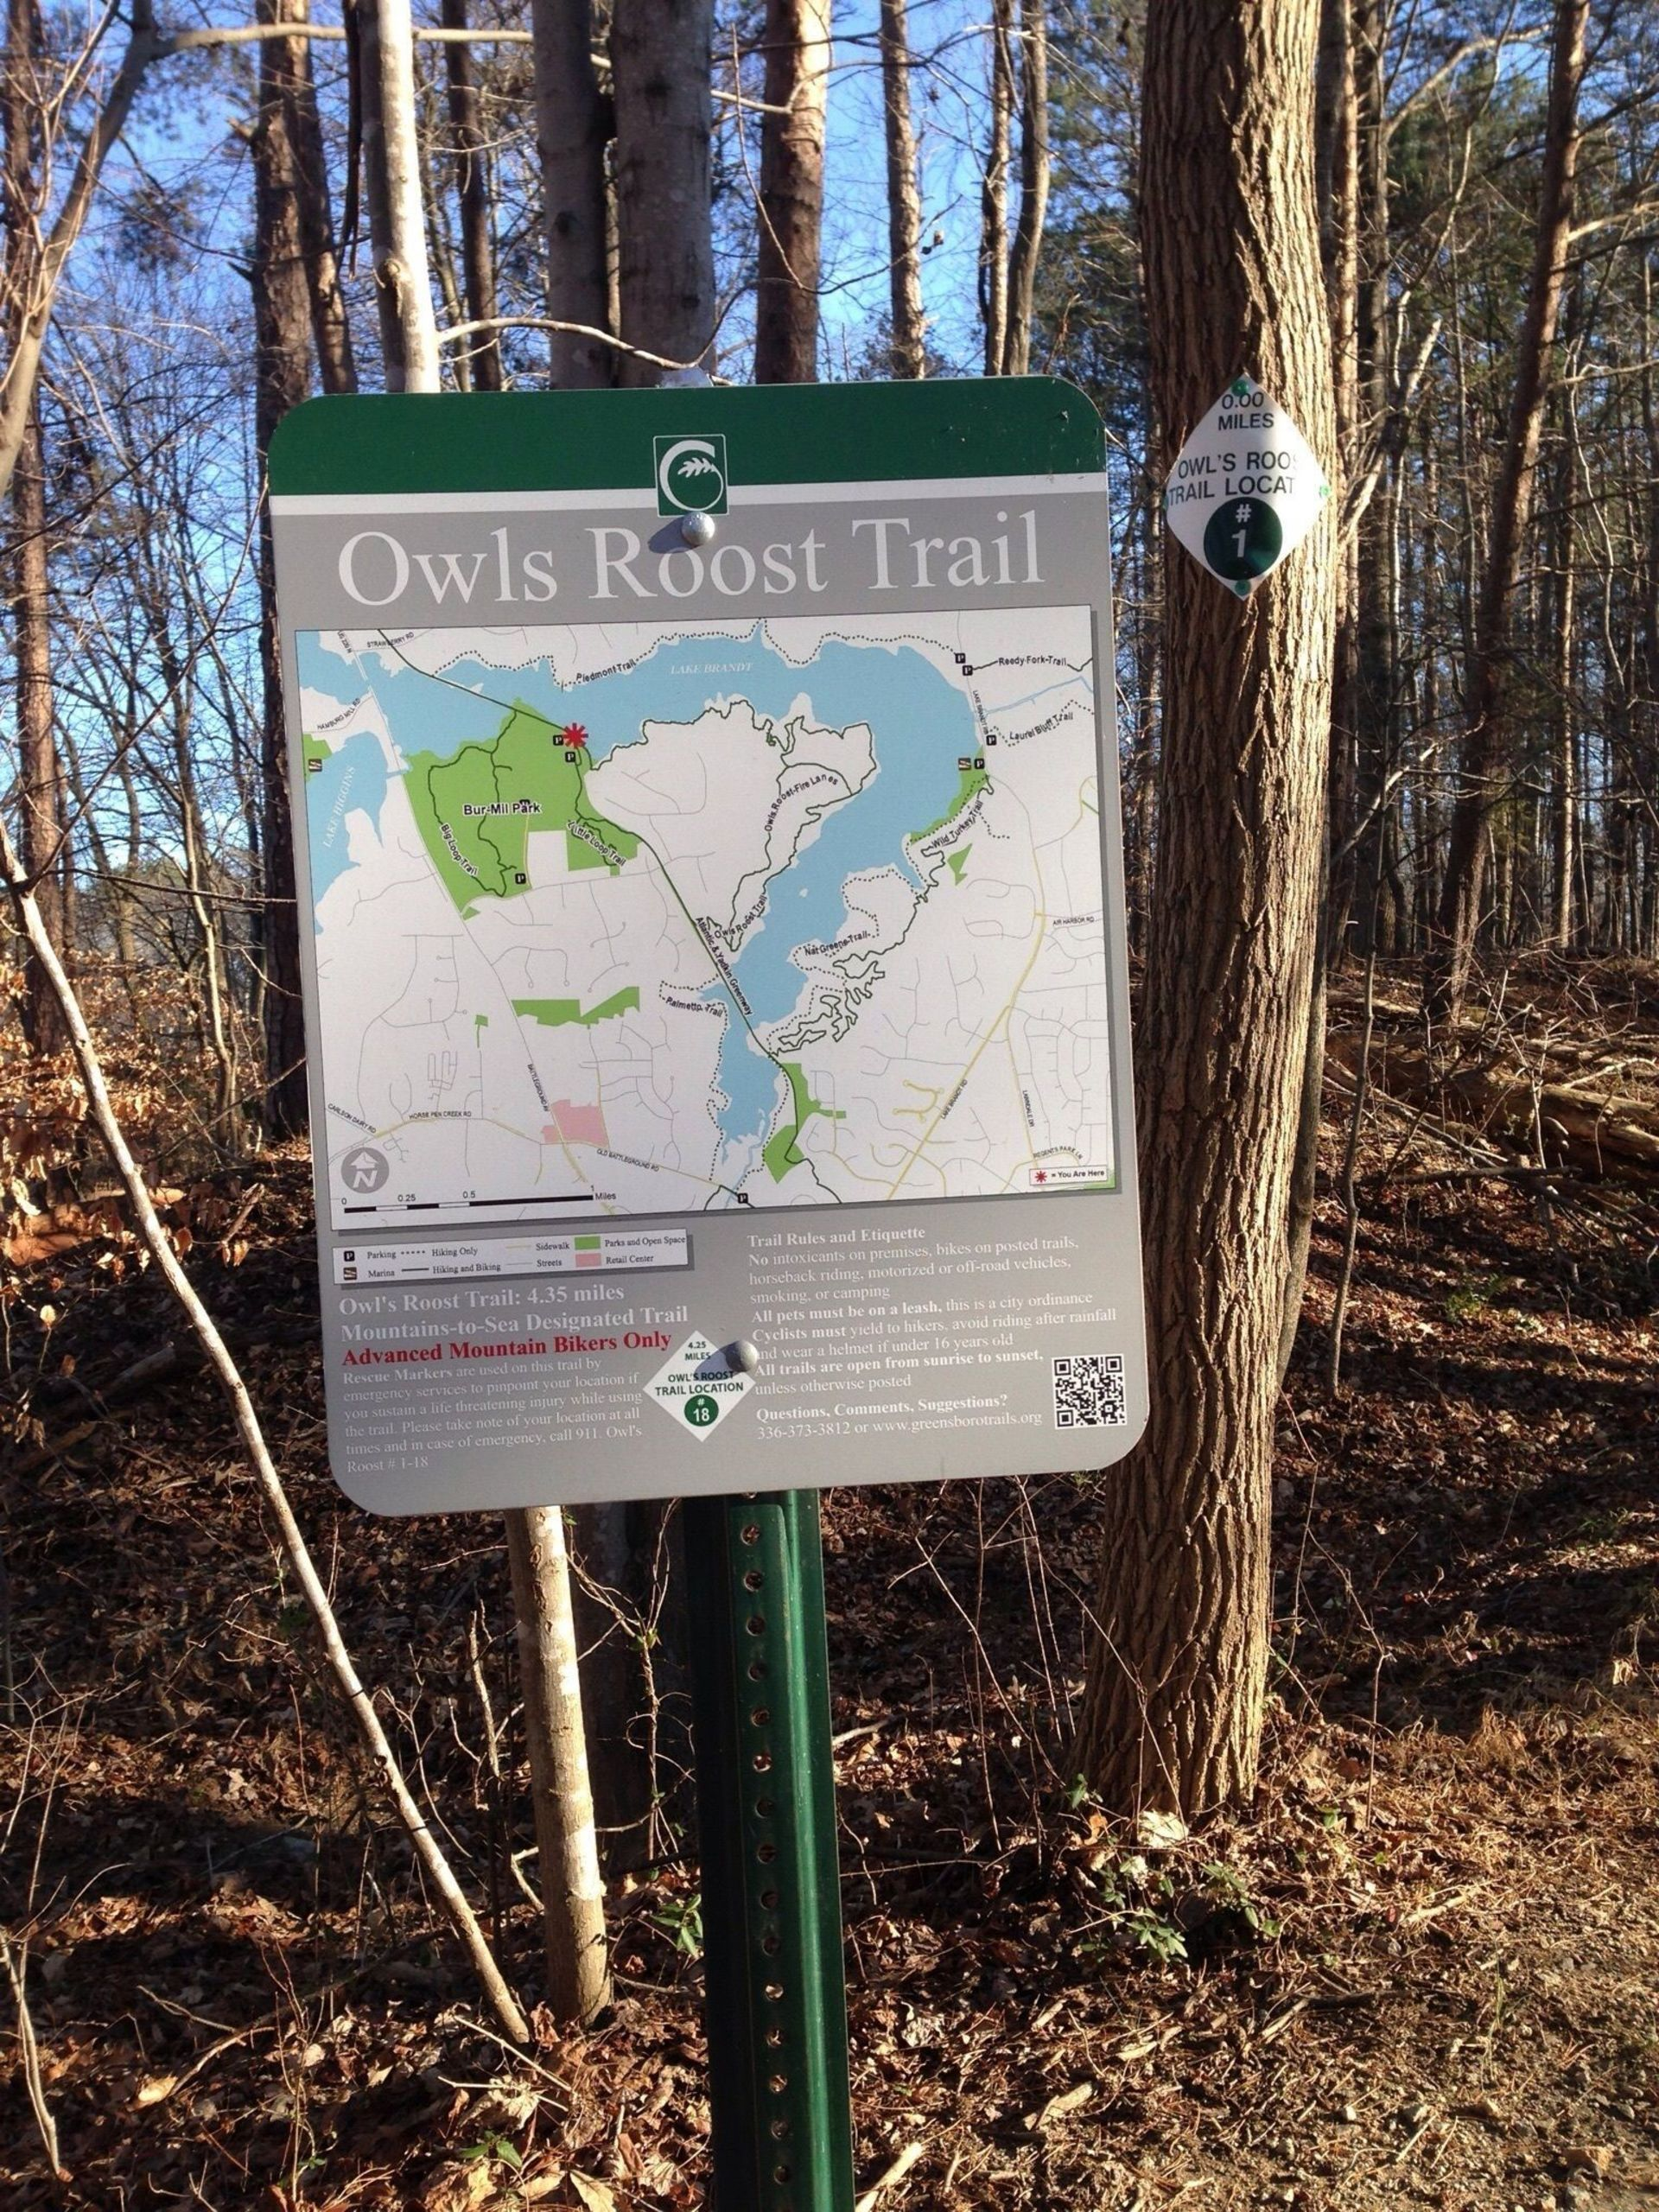 Explore Greensboro's Hiking & Biking Trails